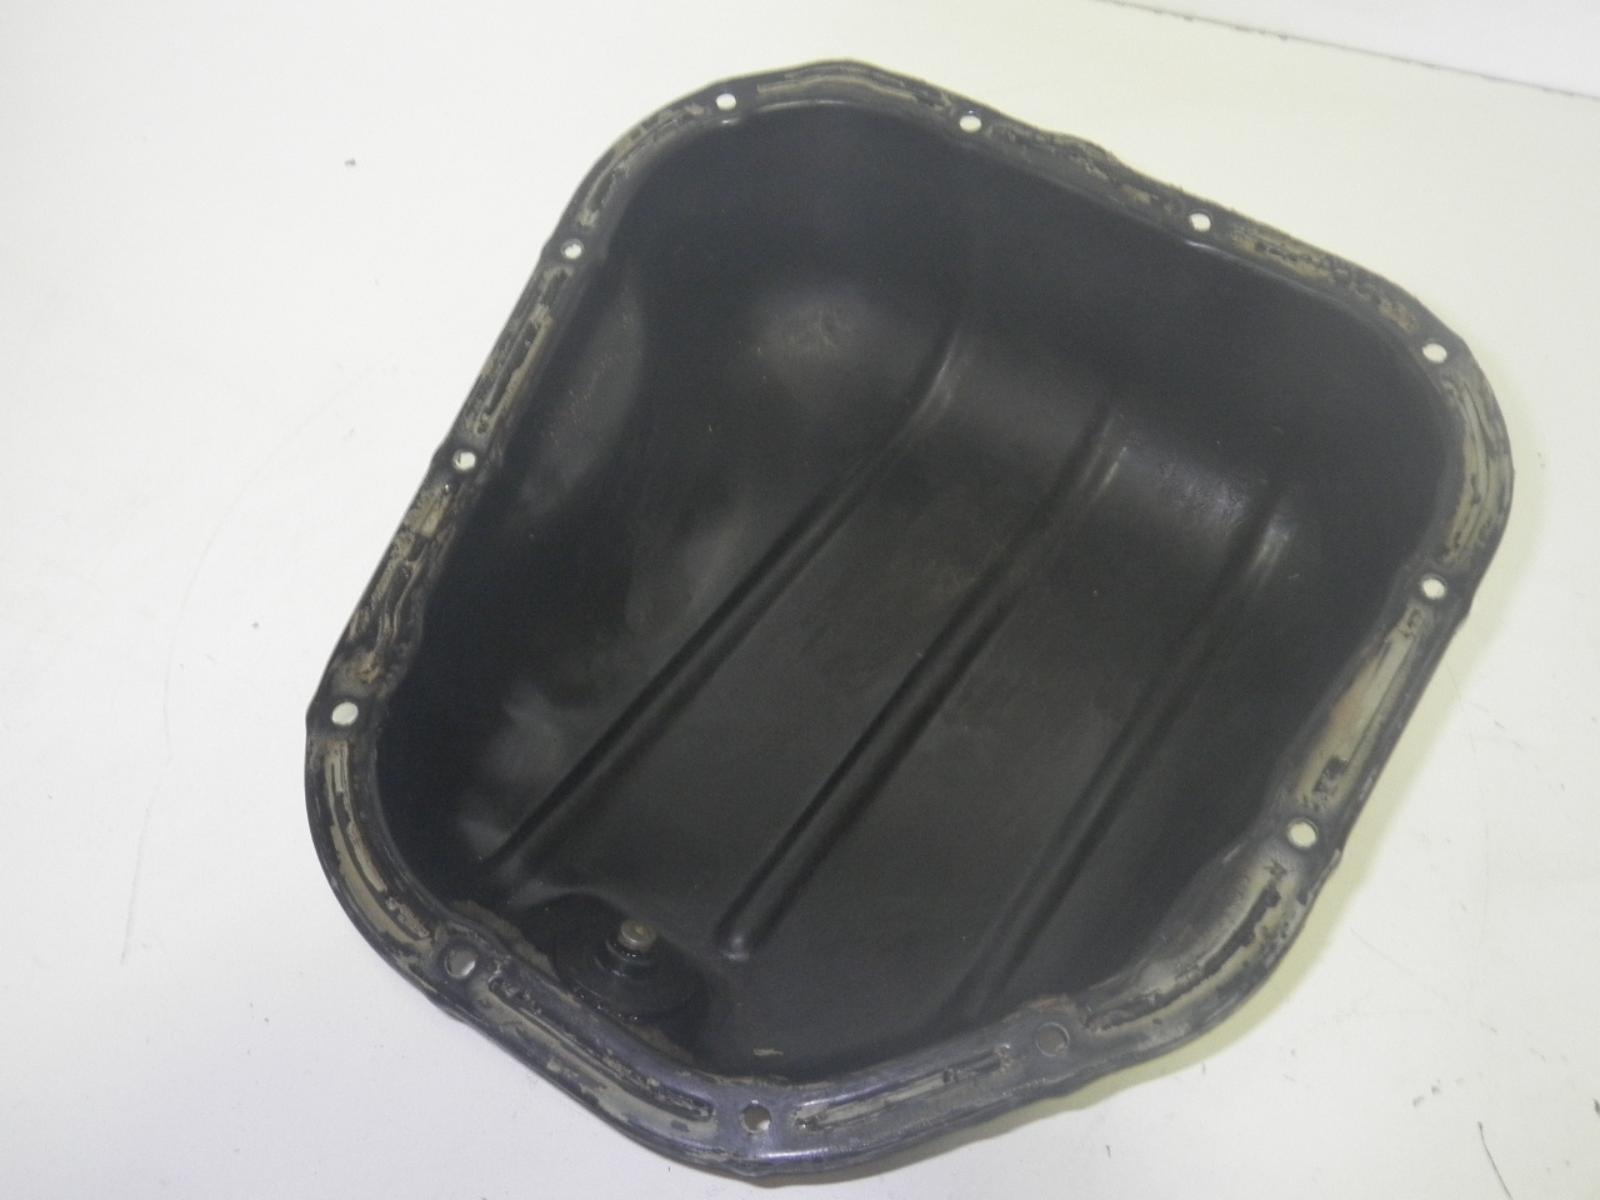 Toyota Sienna Oil Pan 3 0l 1mzfe Engine Lower 98 99 00